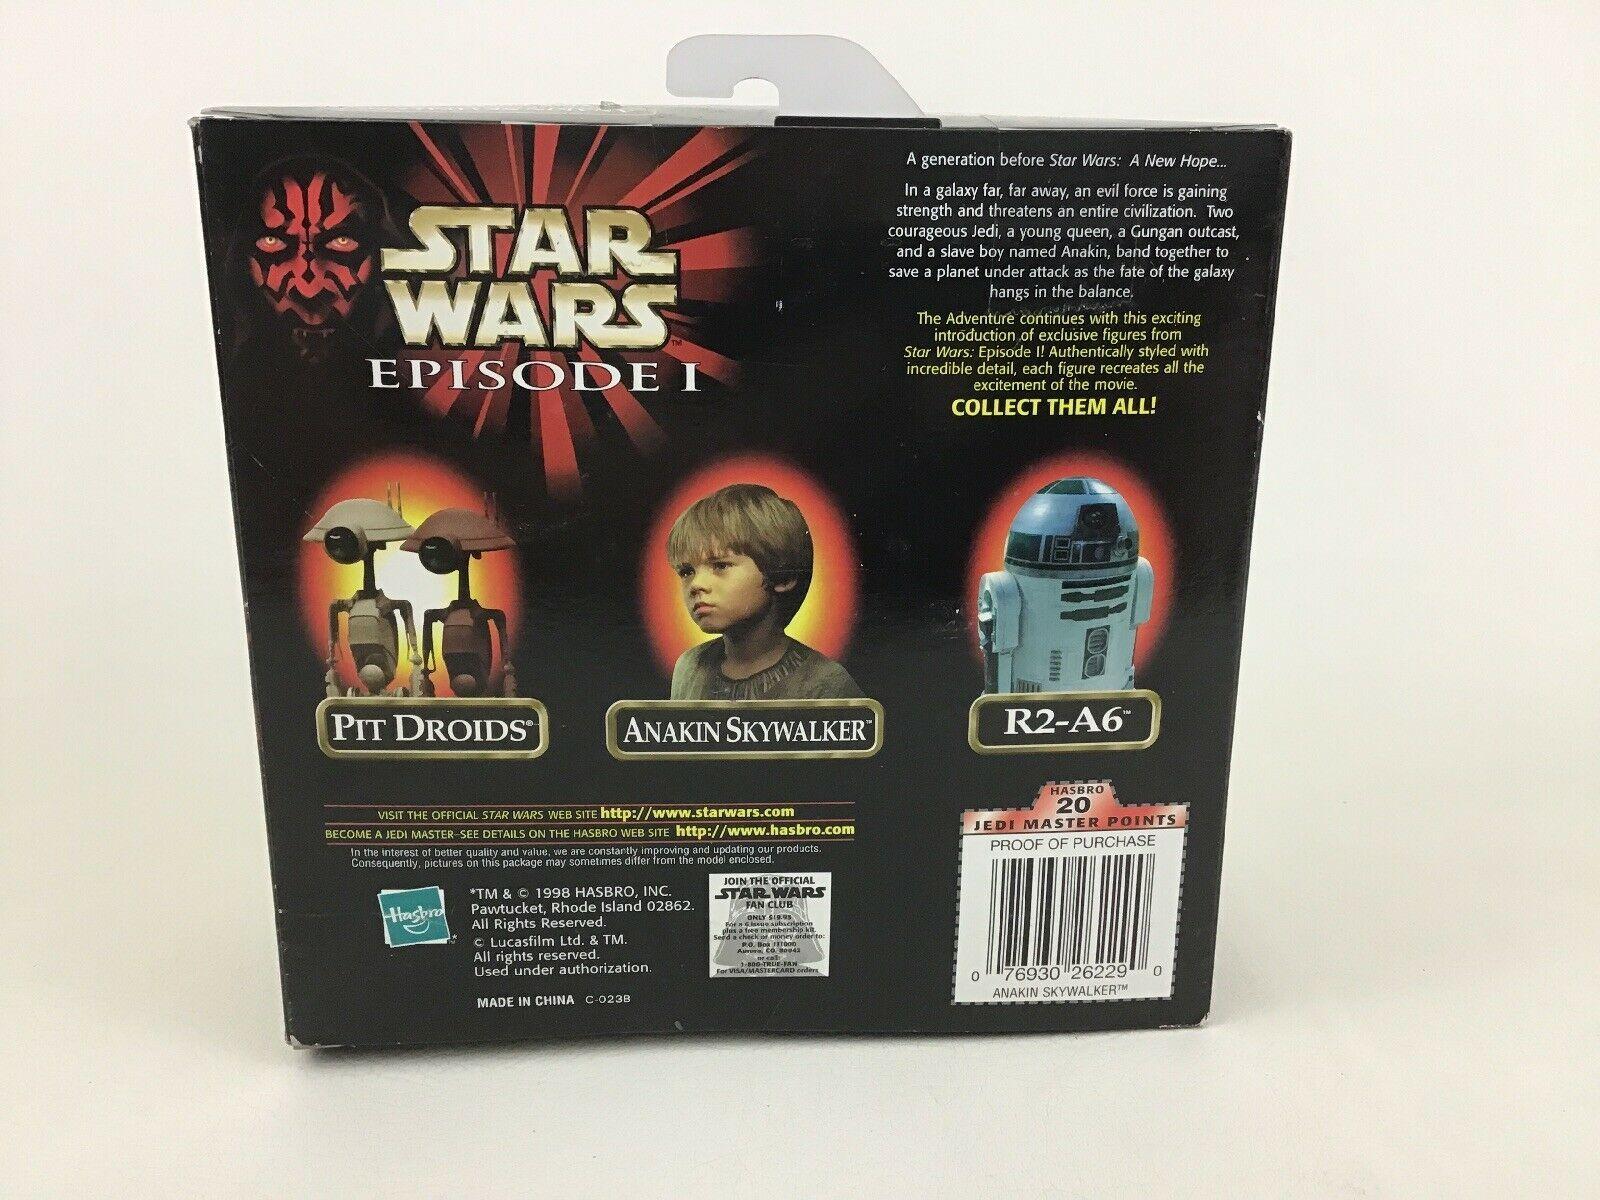 "Anakin Skywalker Action Figure 12"" Scale Star Wars Episode 1 Hasbro 1998"